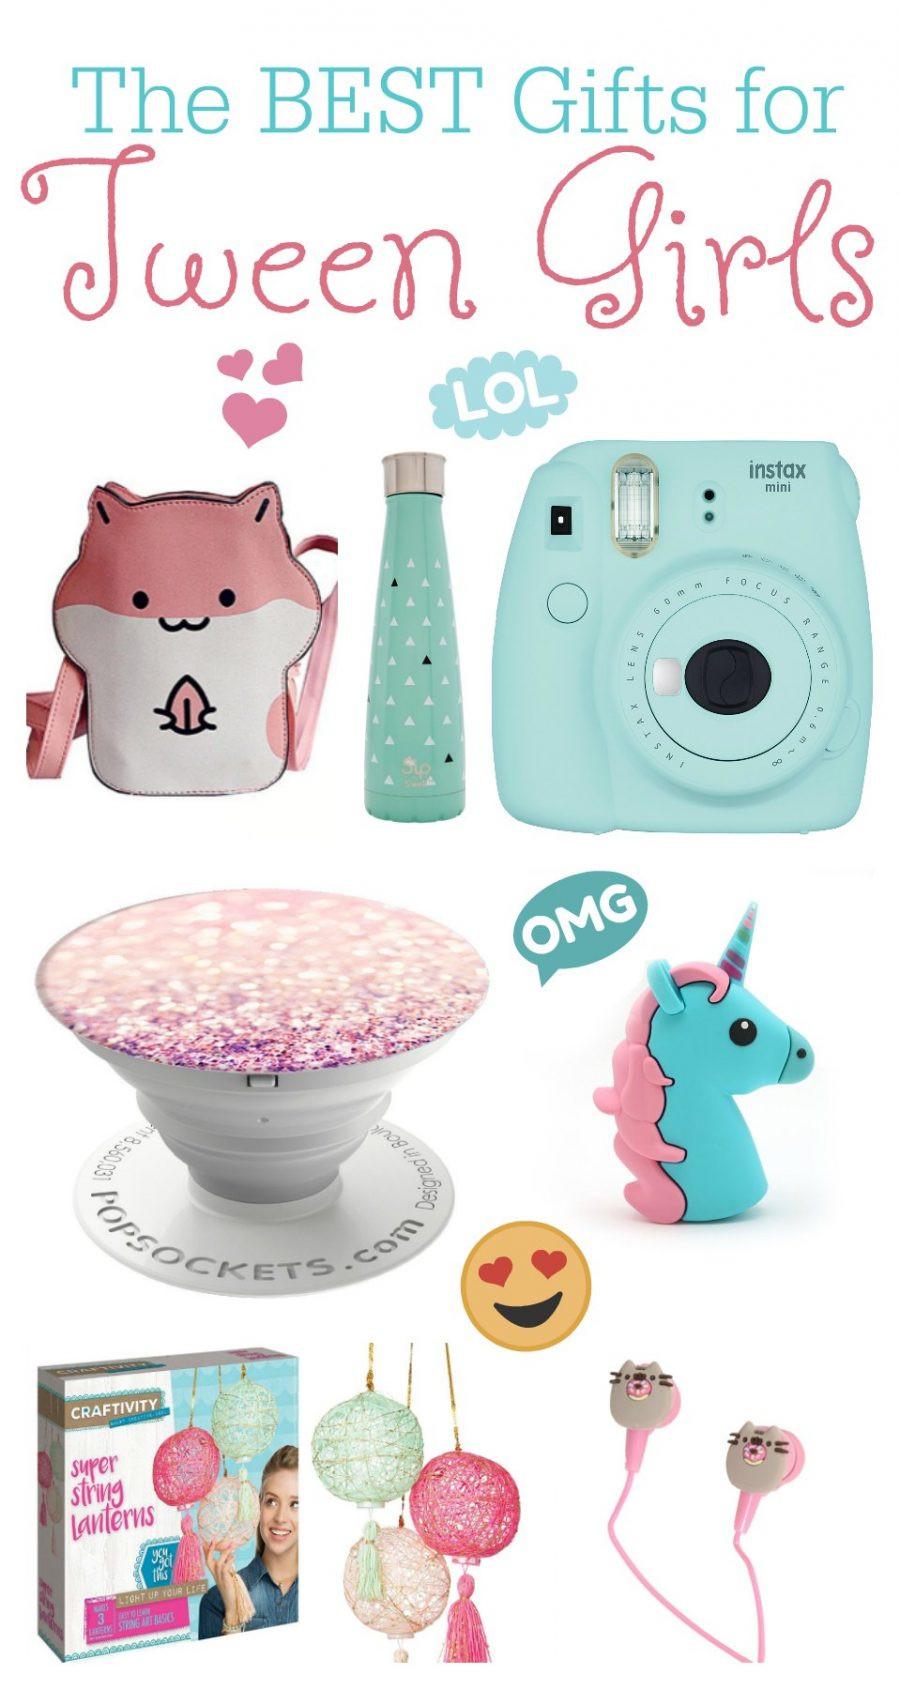 Best ideas about Tween Gift Ideas Girls . Save or Pin The BEST Gift Ideas for Tween Girls Now.